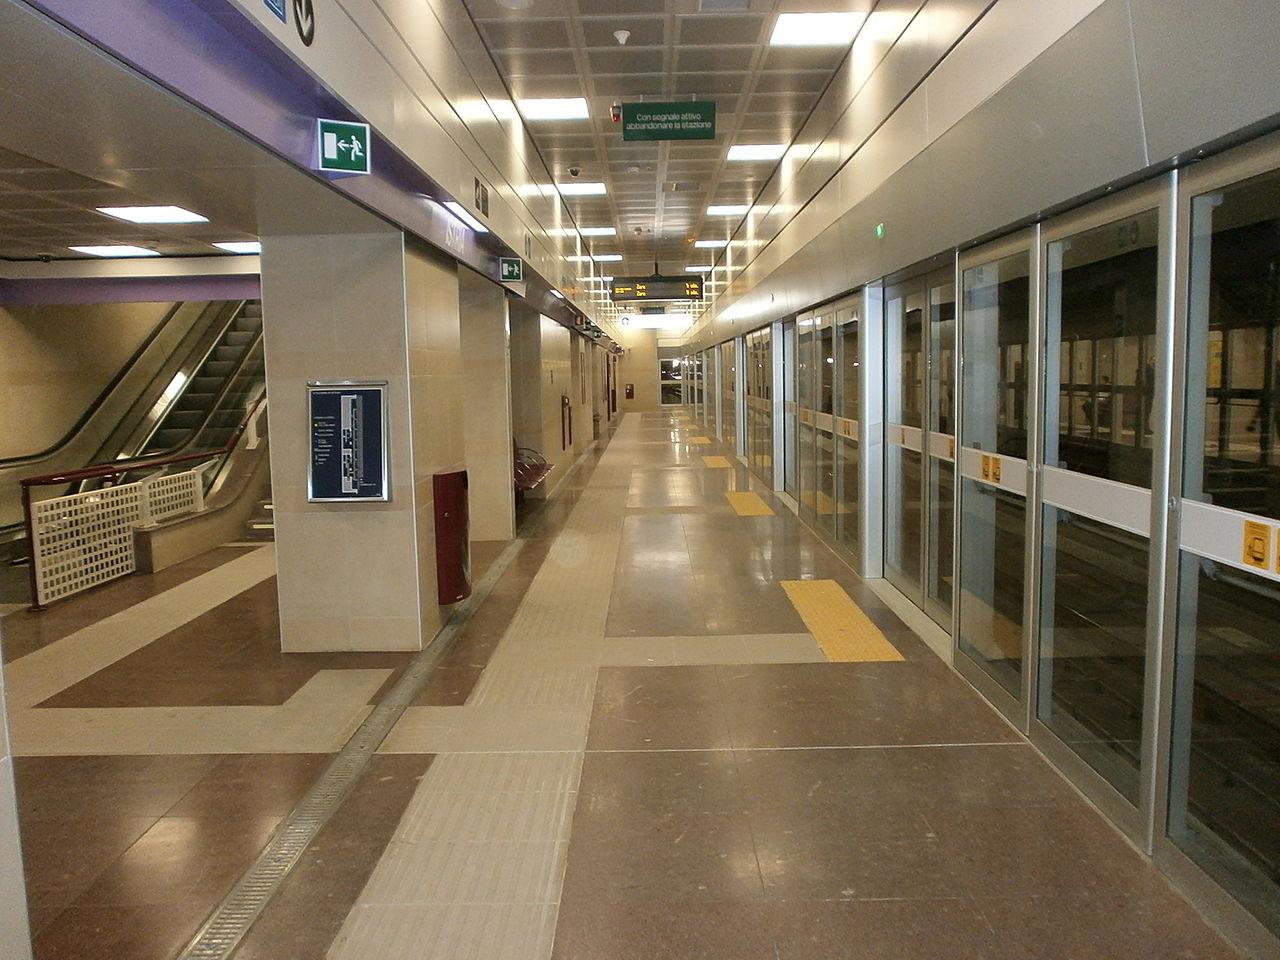 https://thesubmarine.it/wp-content/uploads/2018/12/Metropolitana_di_Milano_-_linea_M5_lilla_-_banchina_stazione_Istria_-_Milano_-_03-1280x960.jpg